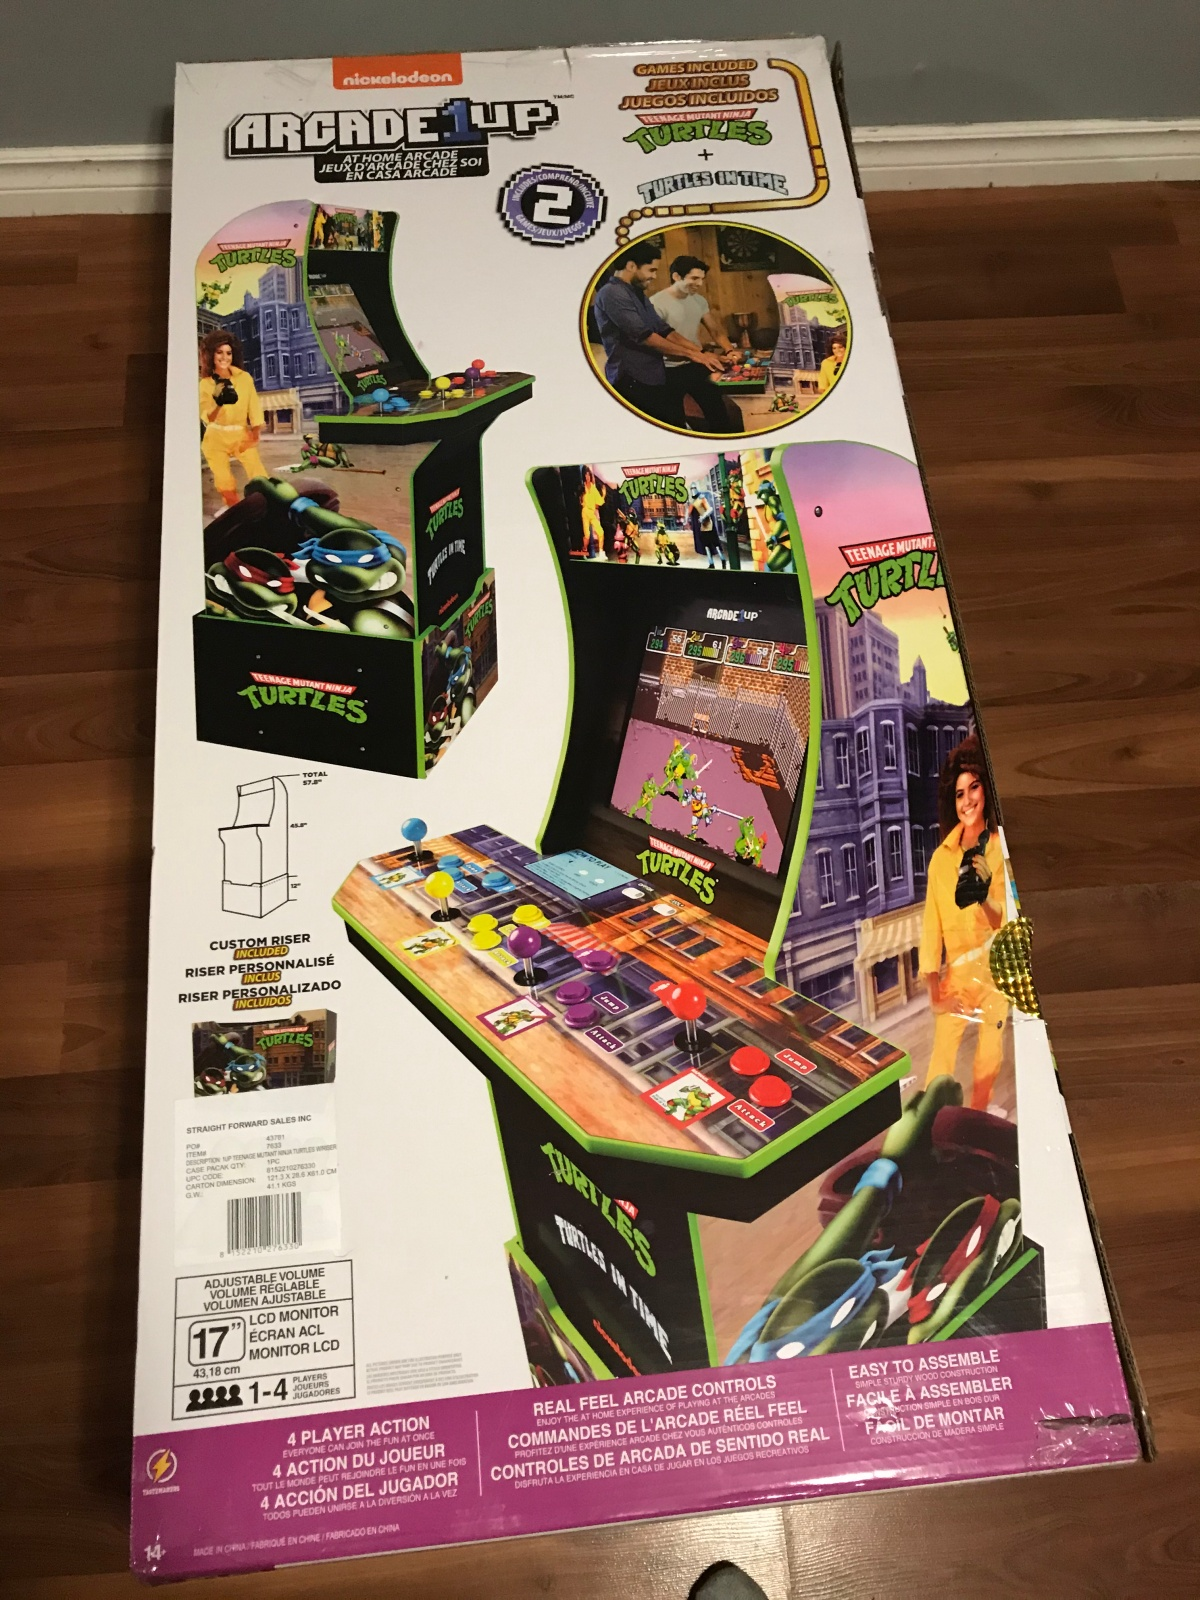 Review: Arcade 1Up's Teenage Mutant Ninja Turtles ArcadeCabinet